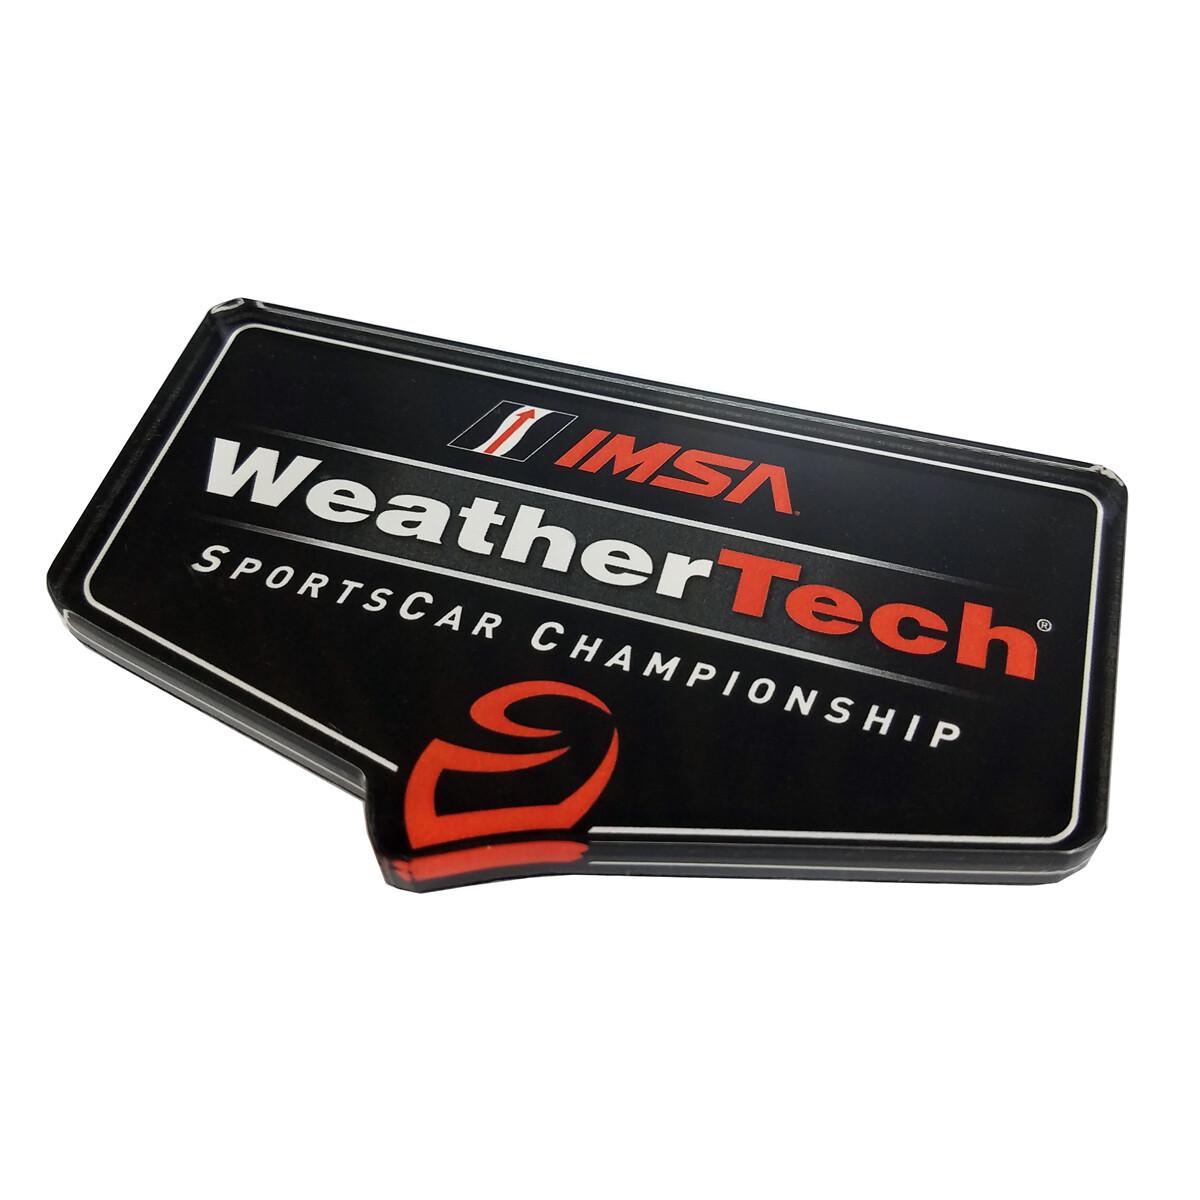 IMSA WeatherTech Magnet